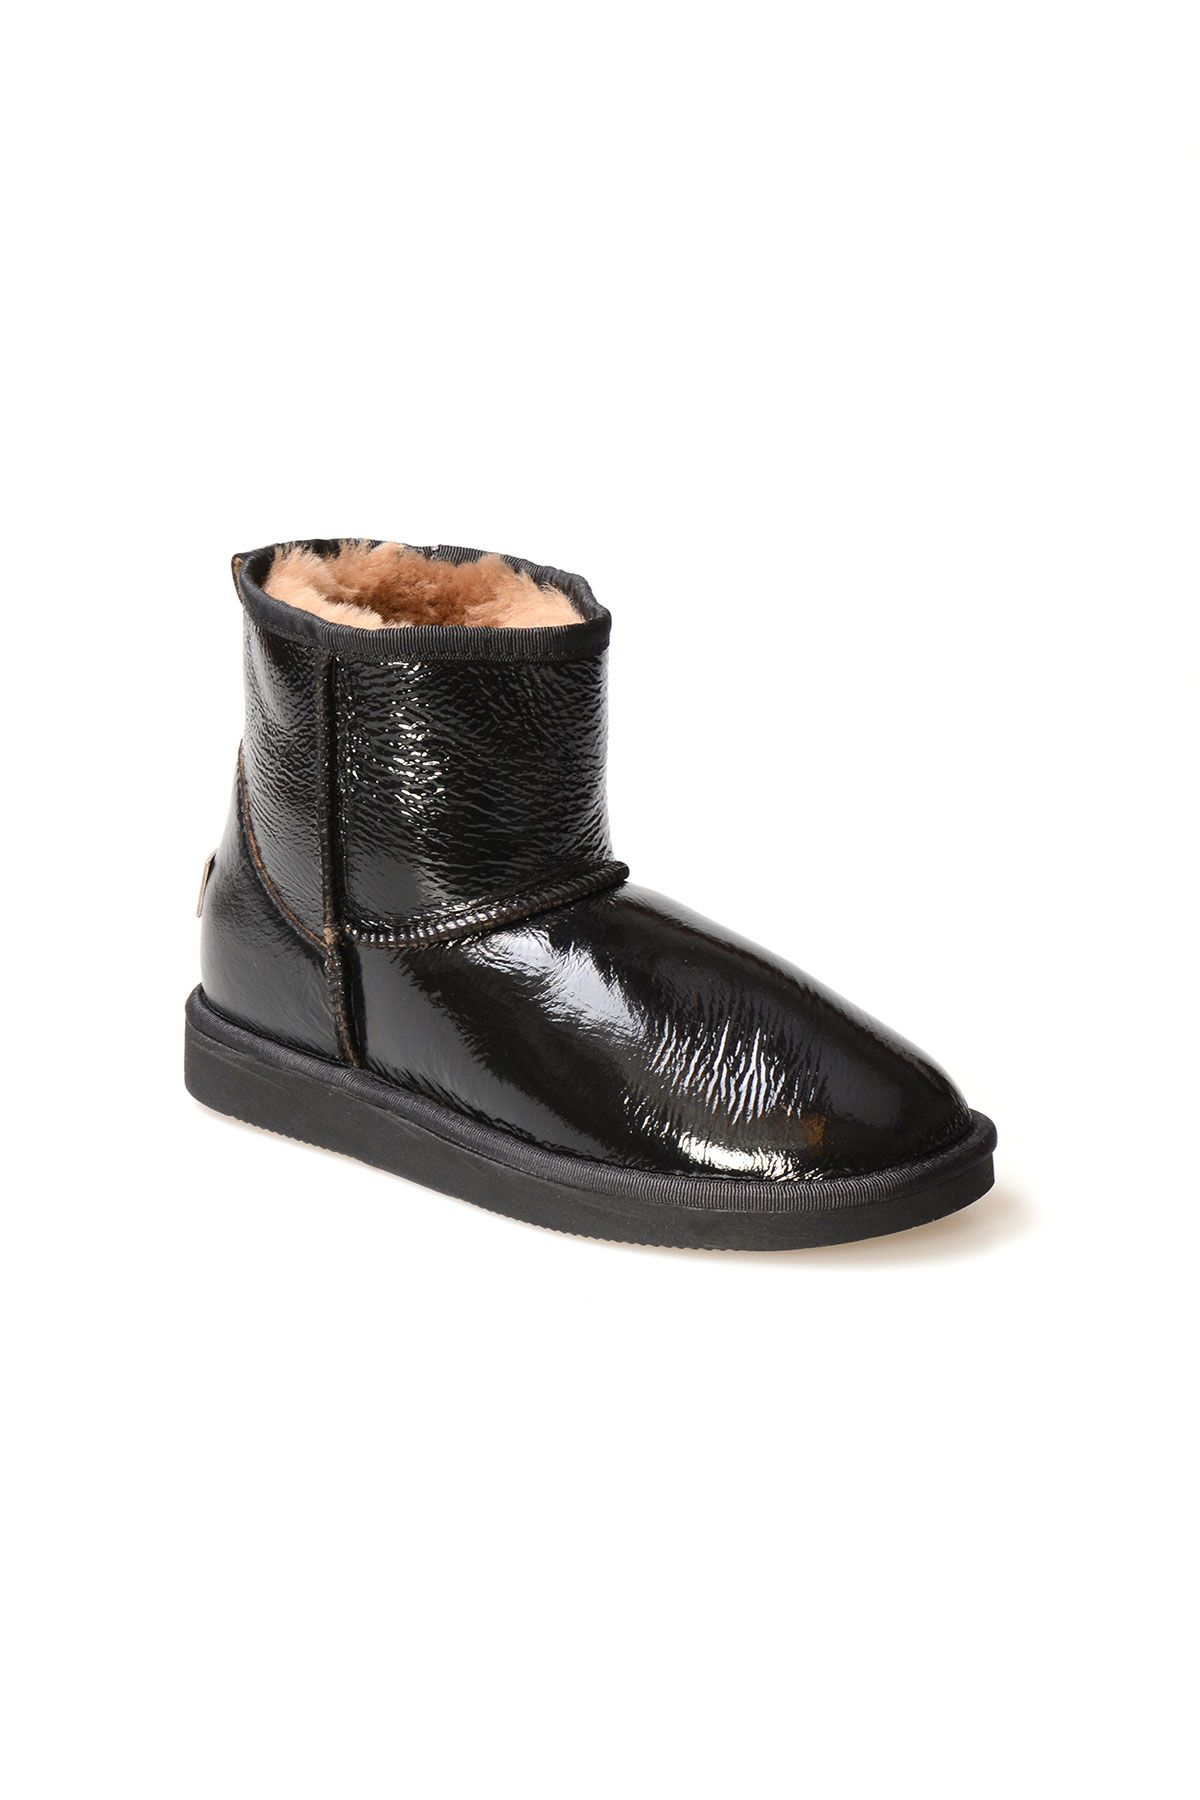 Pegia Genuine Rugan Sheepskin Lined Women's Ankle Boots 191049 Black